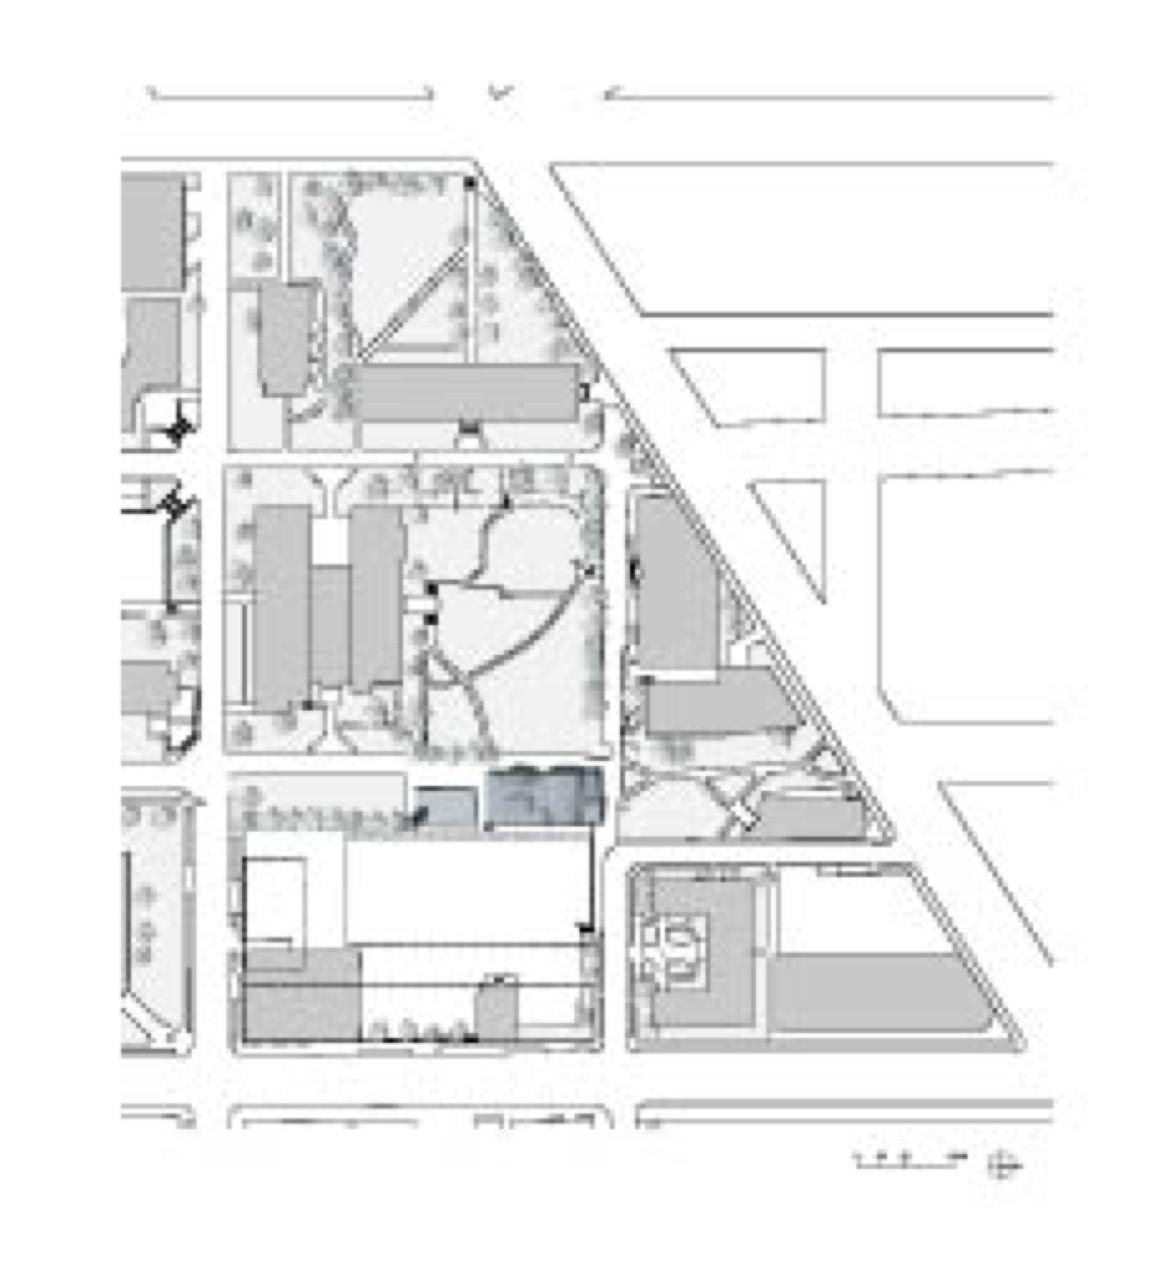 Villa Savoye Floor Plan Gallery Of Ad Classics Chapel Of St Ignatius Steven